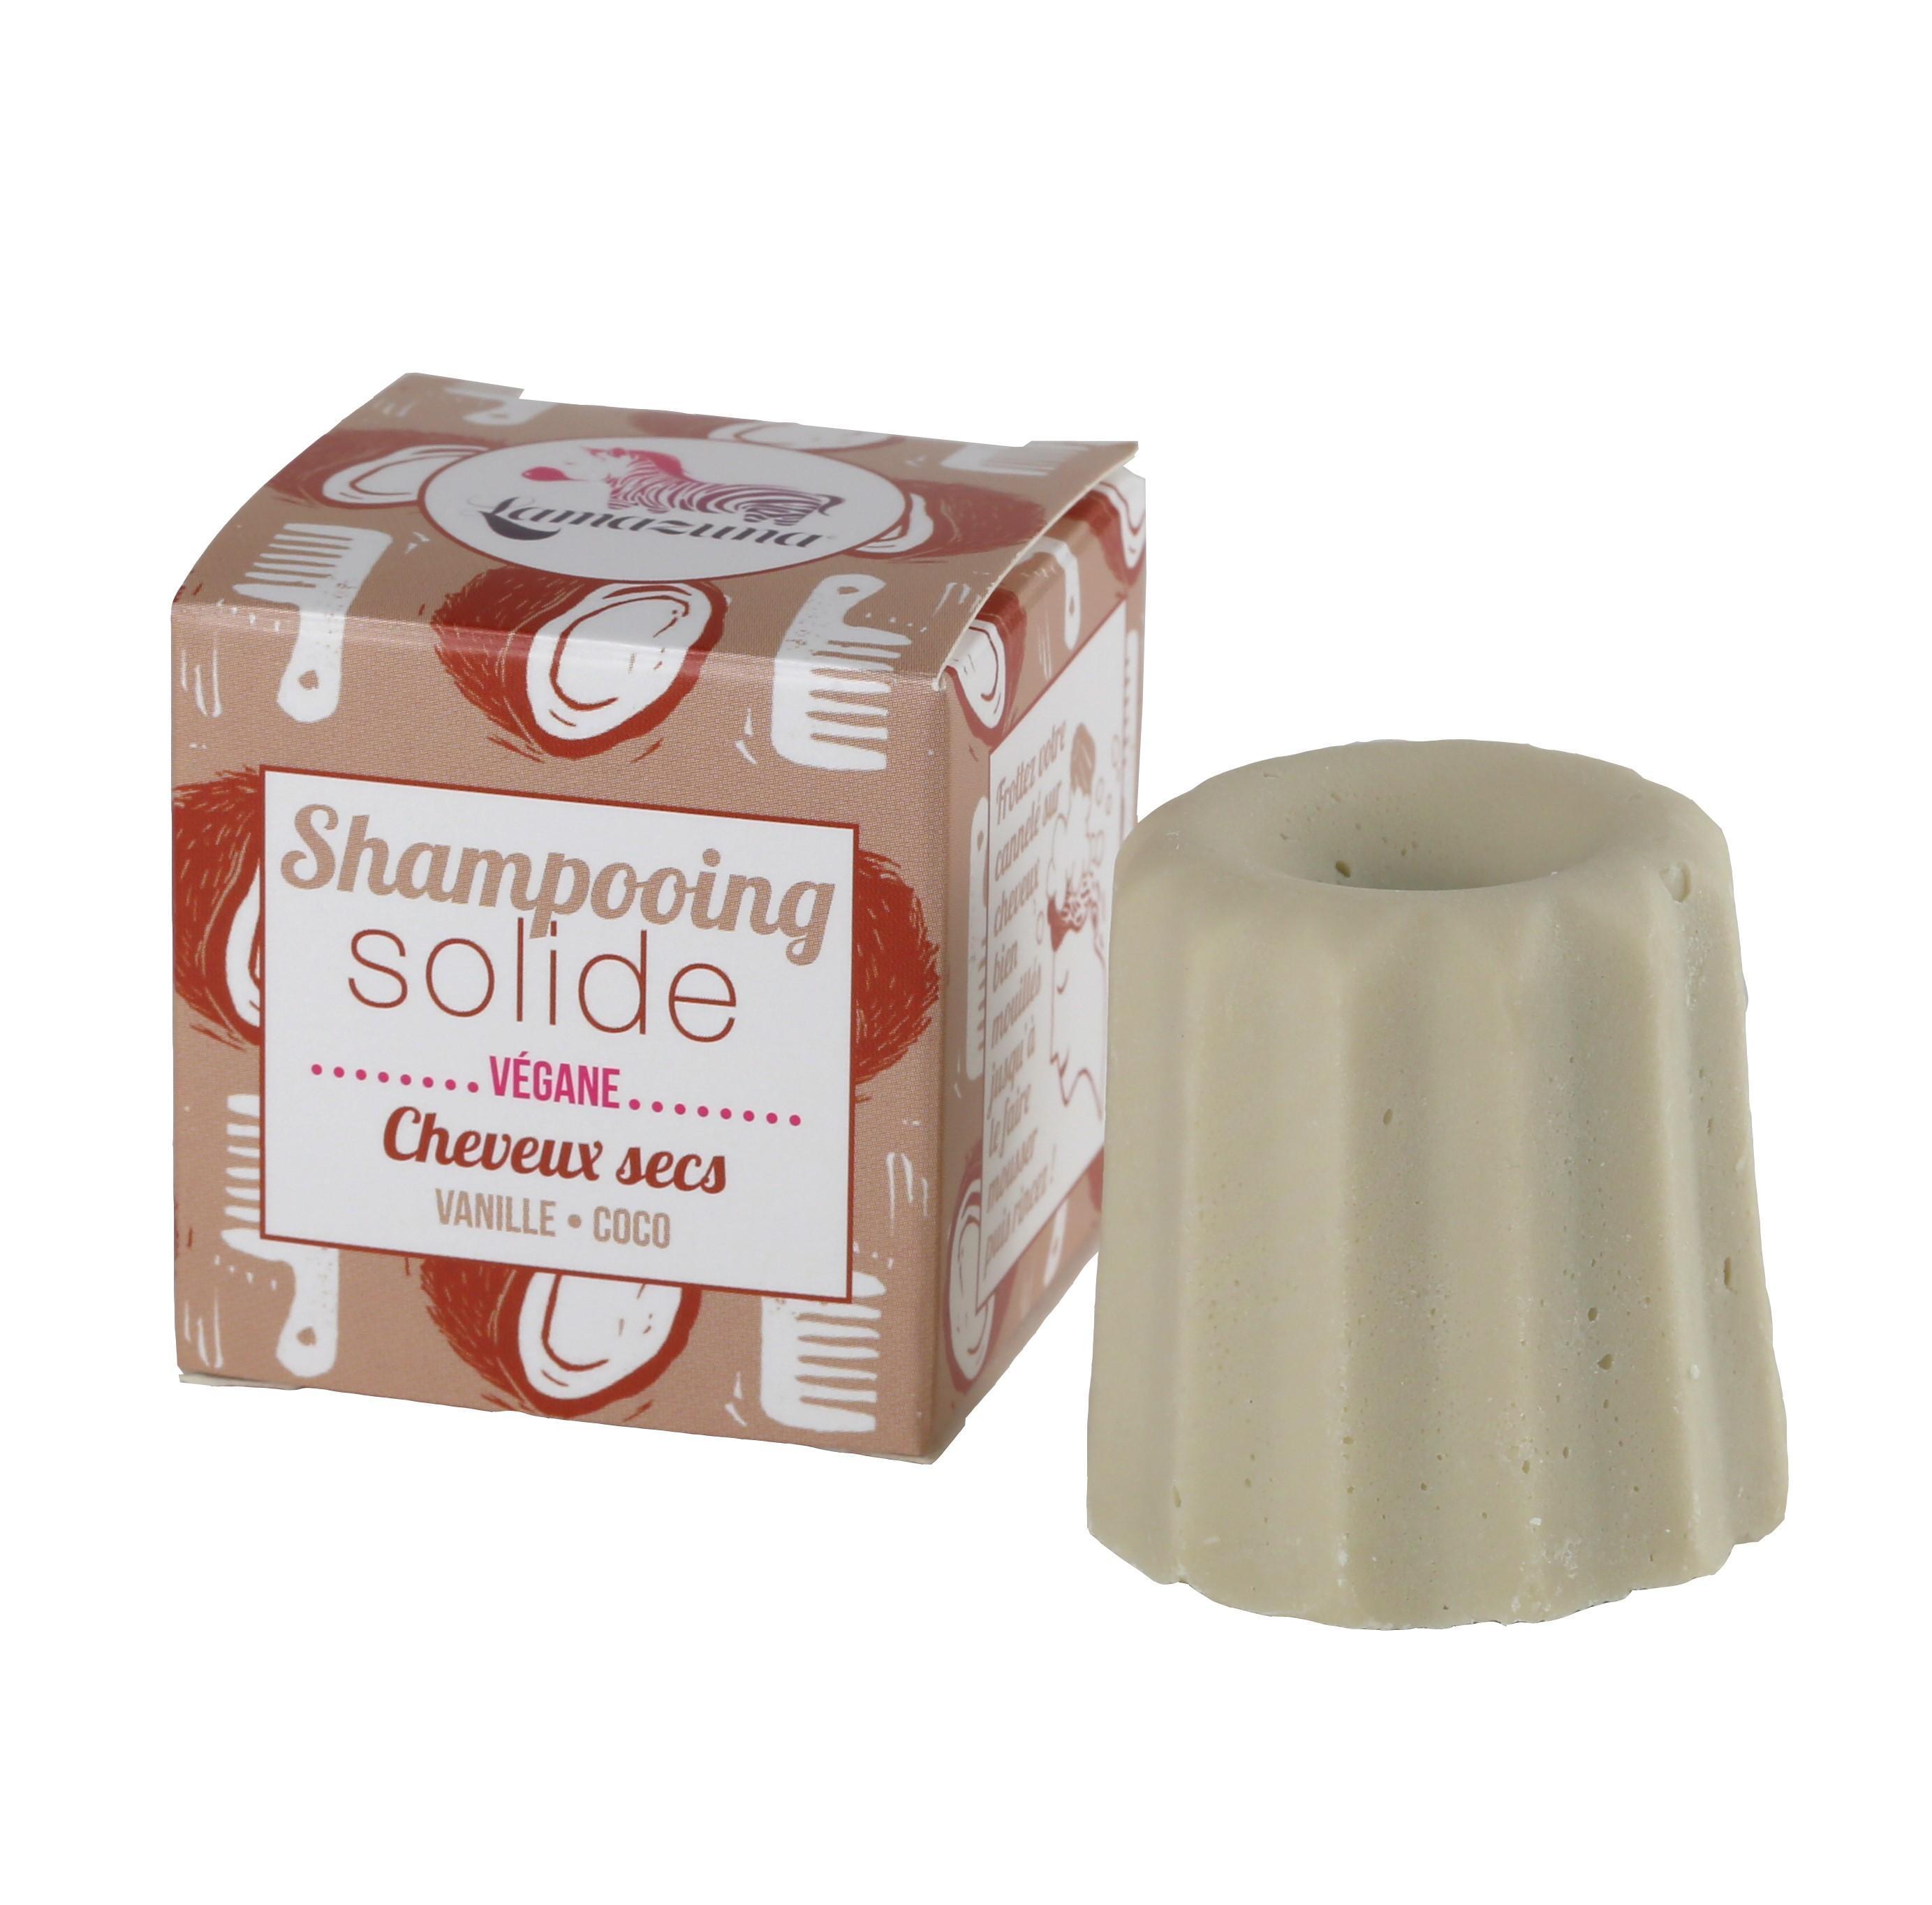 troc de troc epuise shampoing solide vanille coco lamazuna image 0